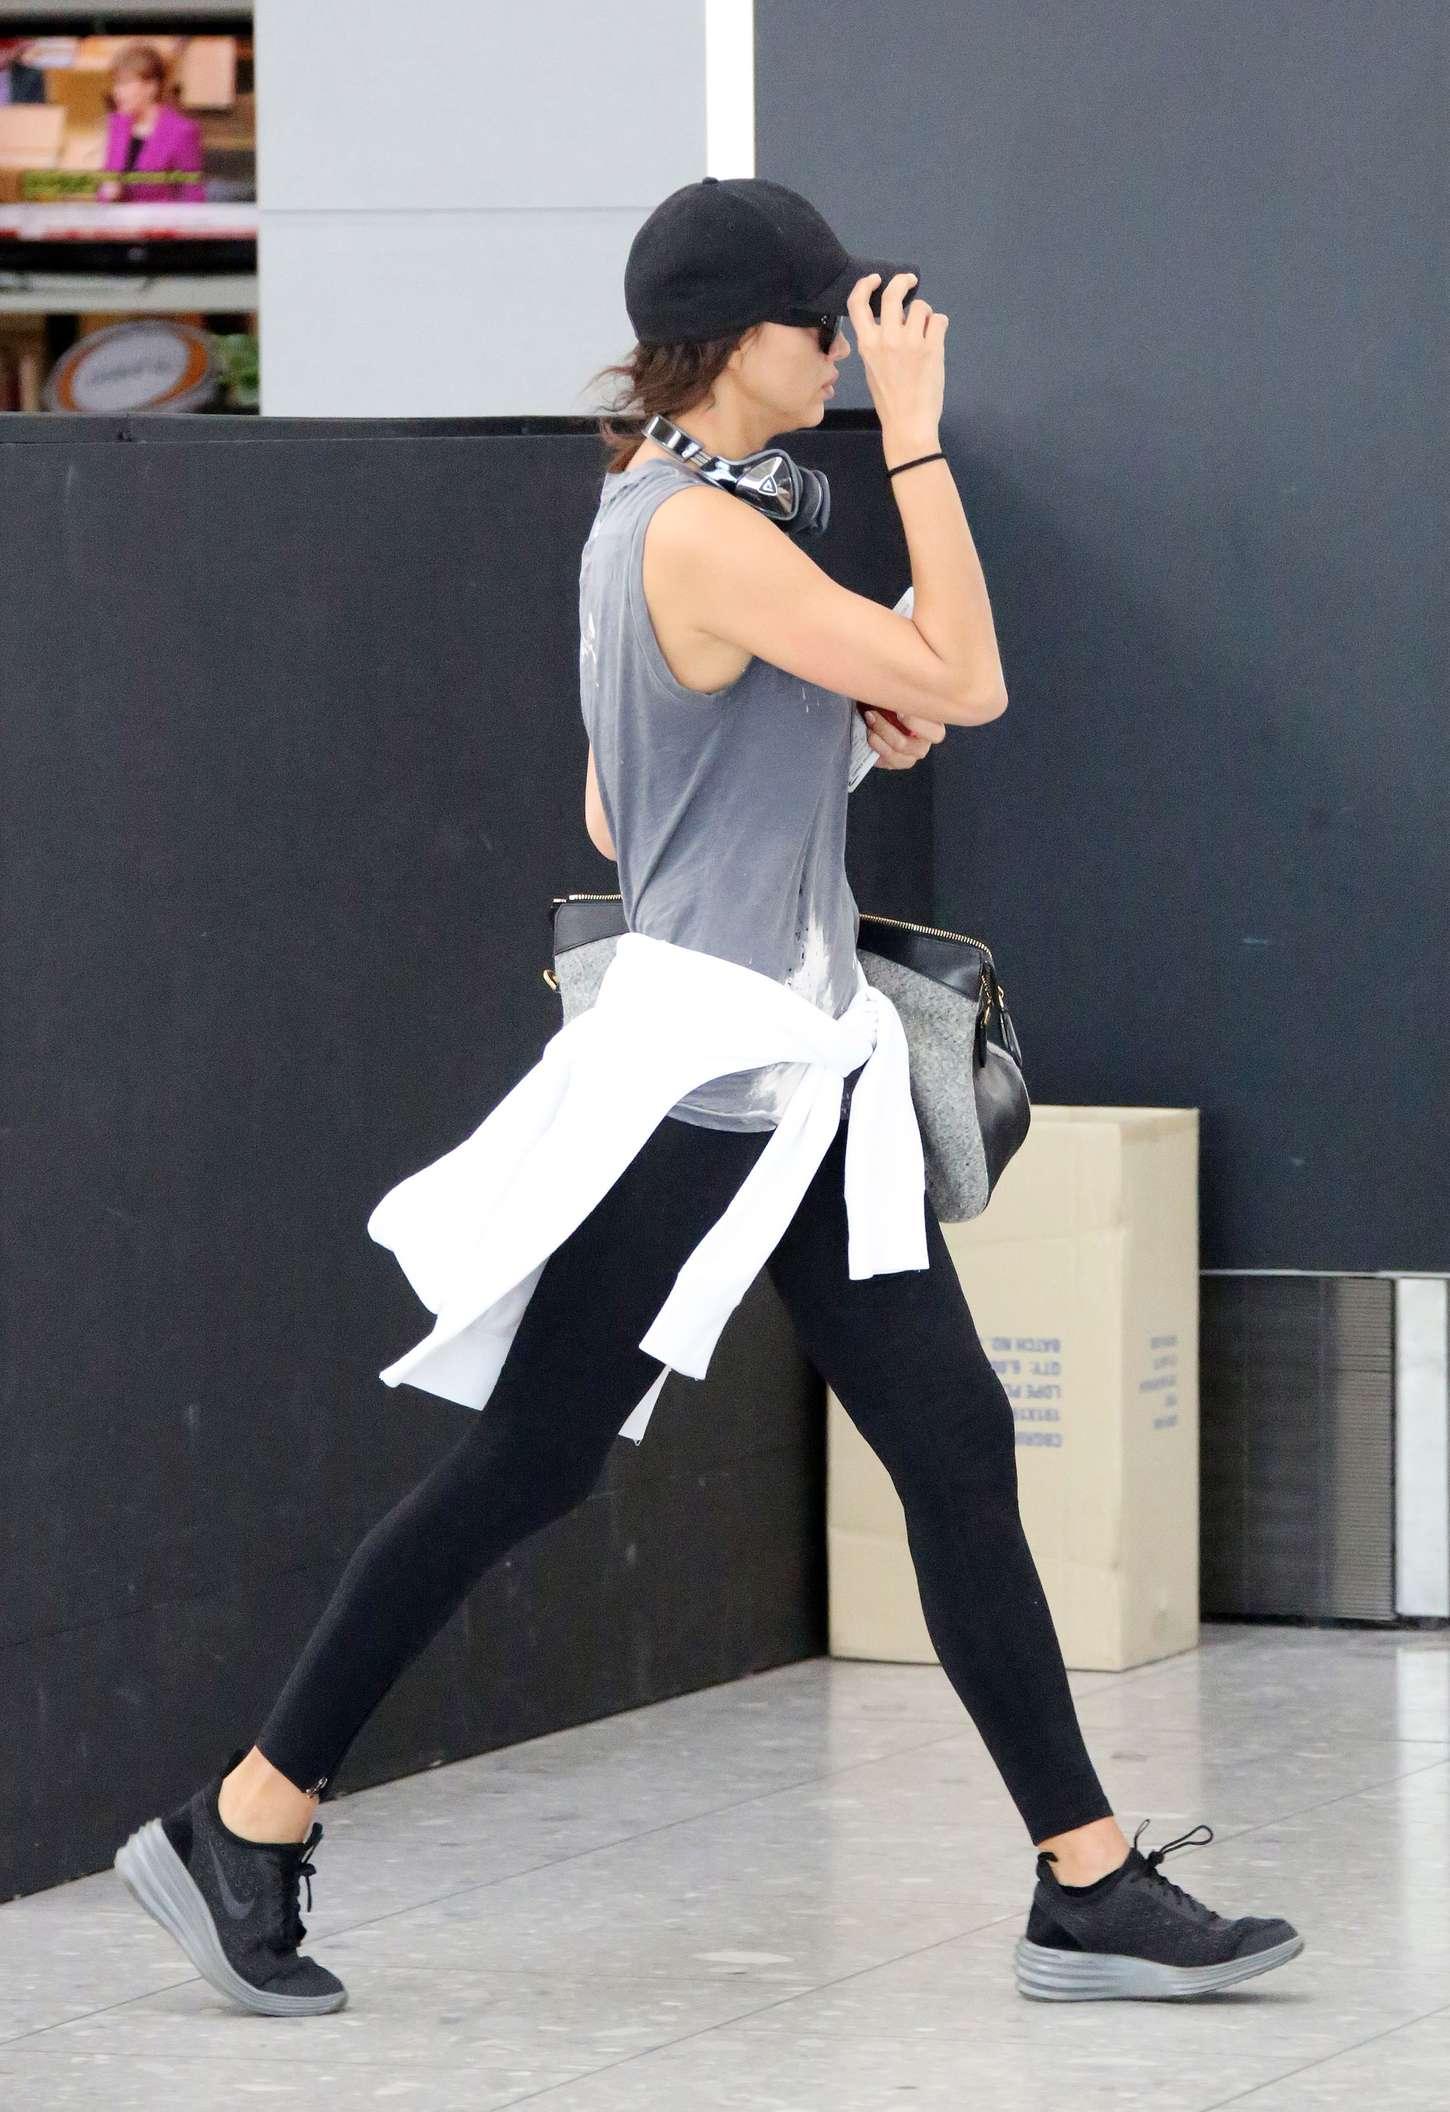 Irina Shayk 2015 : Irina Shayk in Leggings at Heathrow airport -07